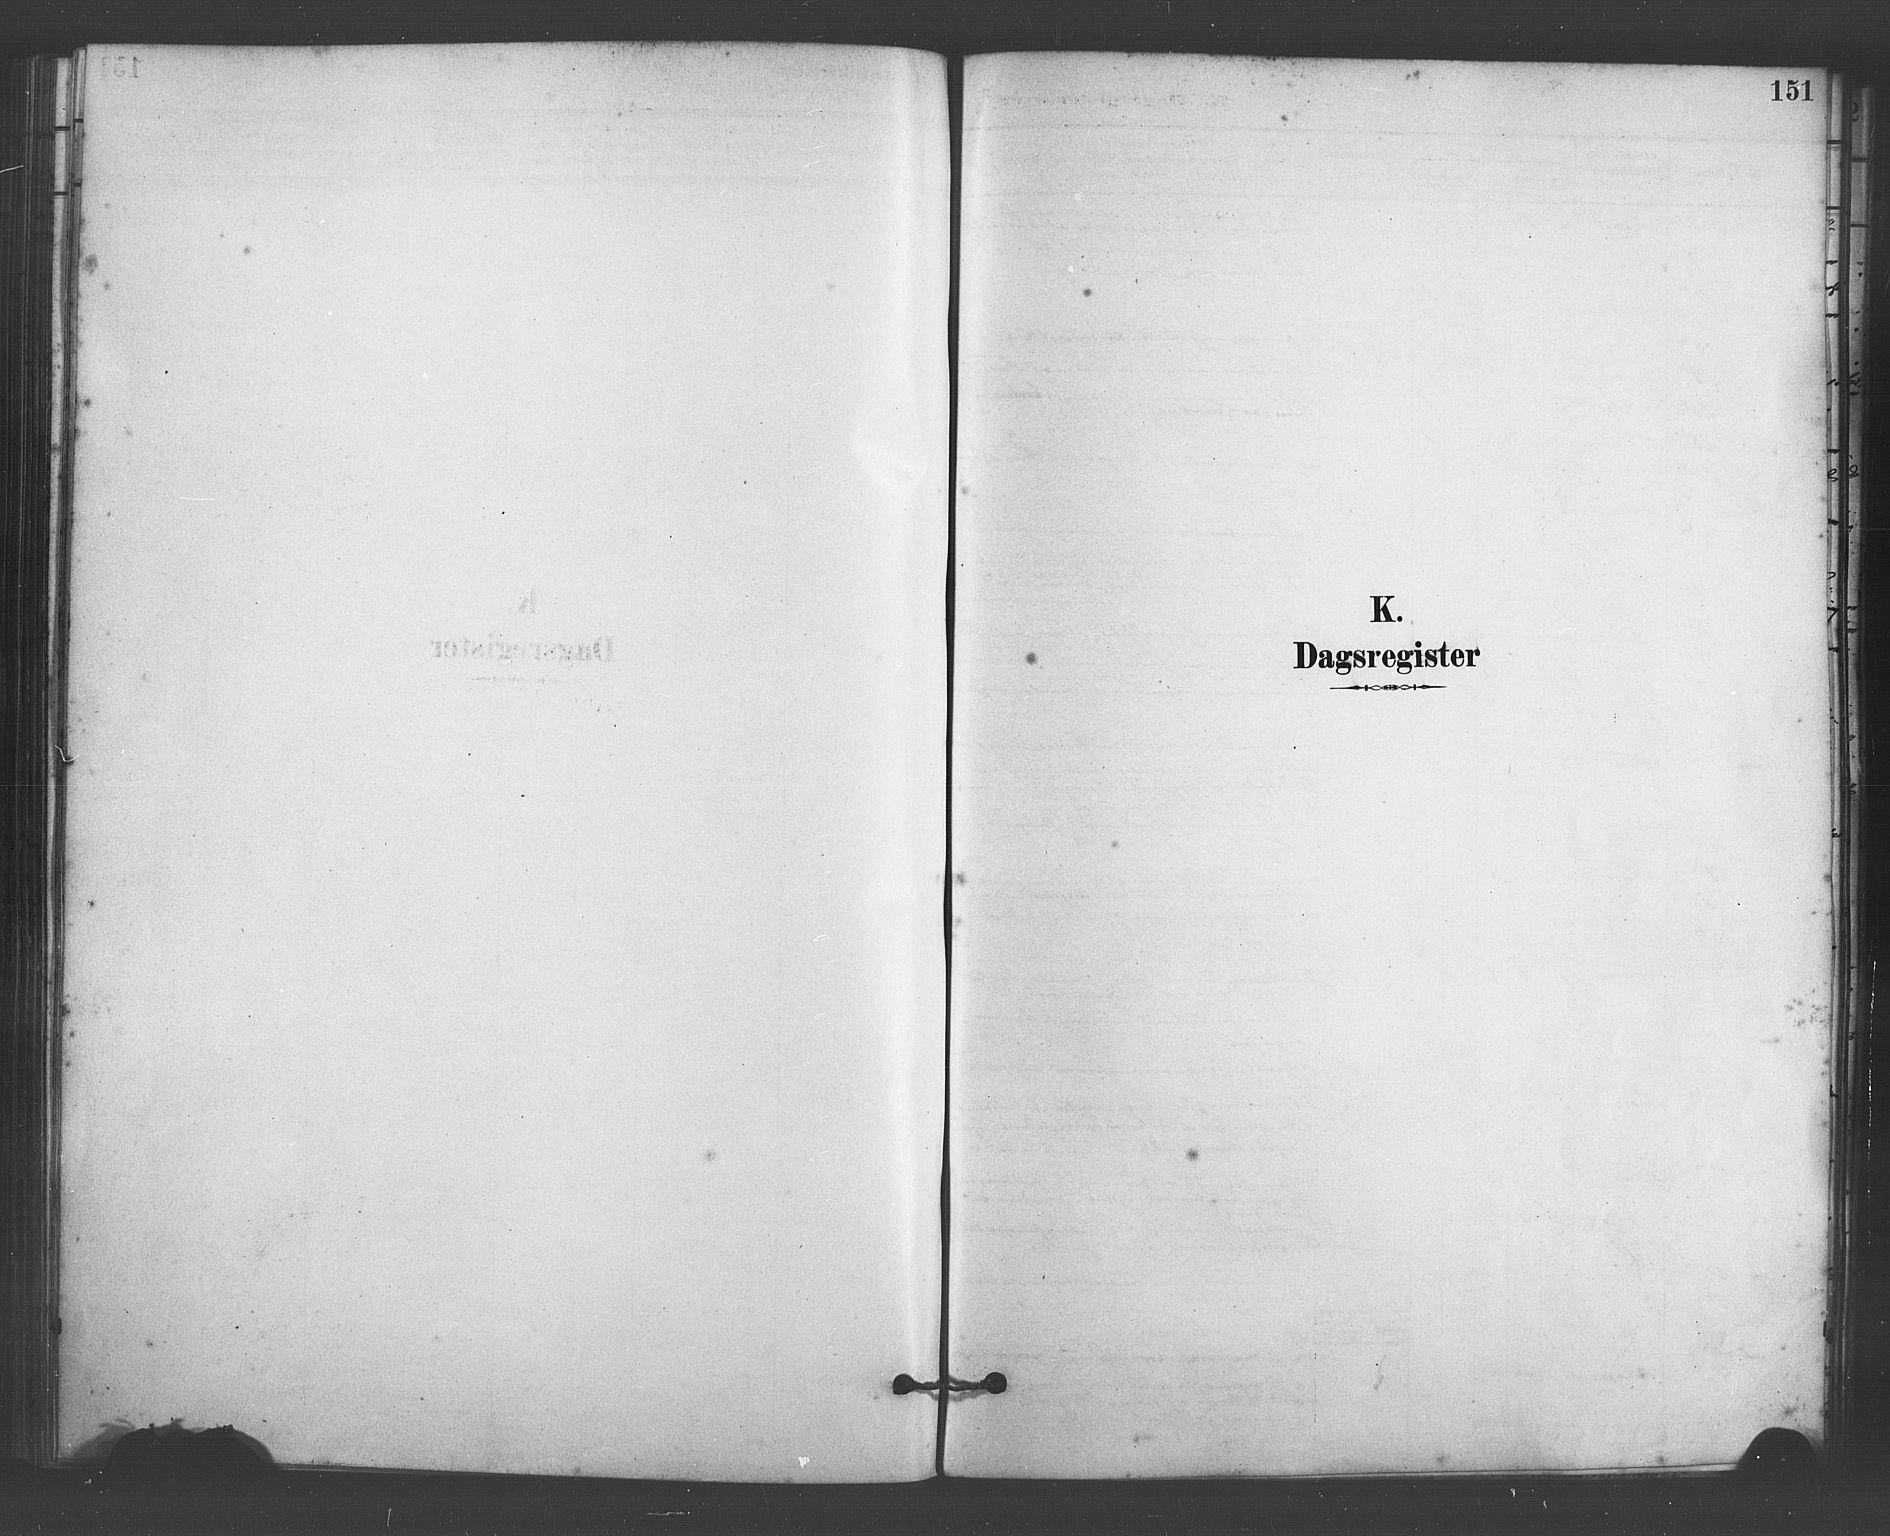 SAB, Fana Sokneprestembete, H/Haa/Haab/L0001: Ministerialbok nr. B 1, 1878-1889, s. 151